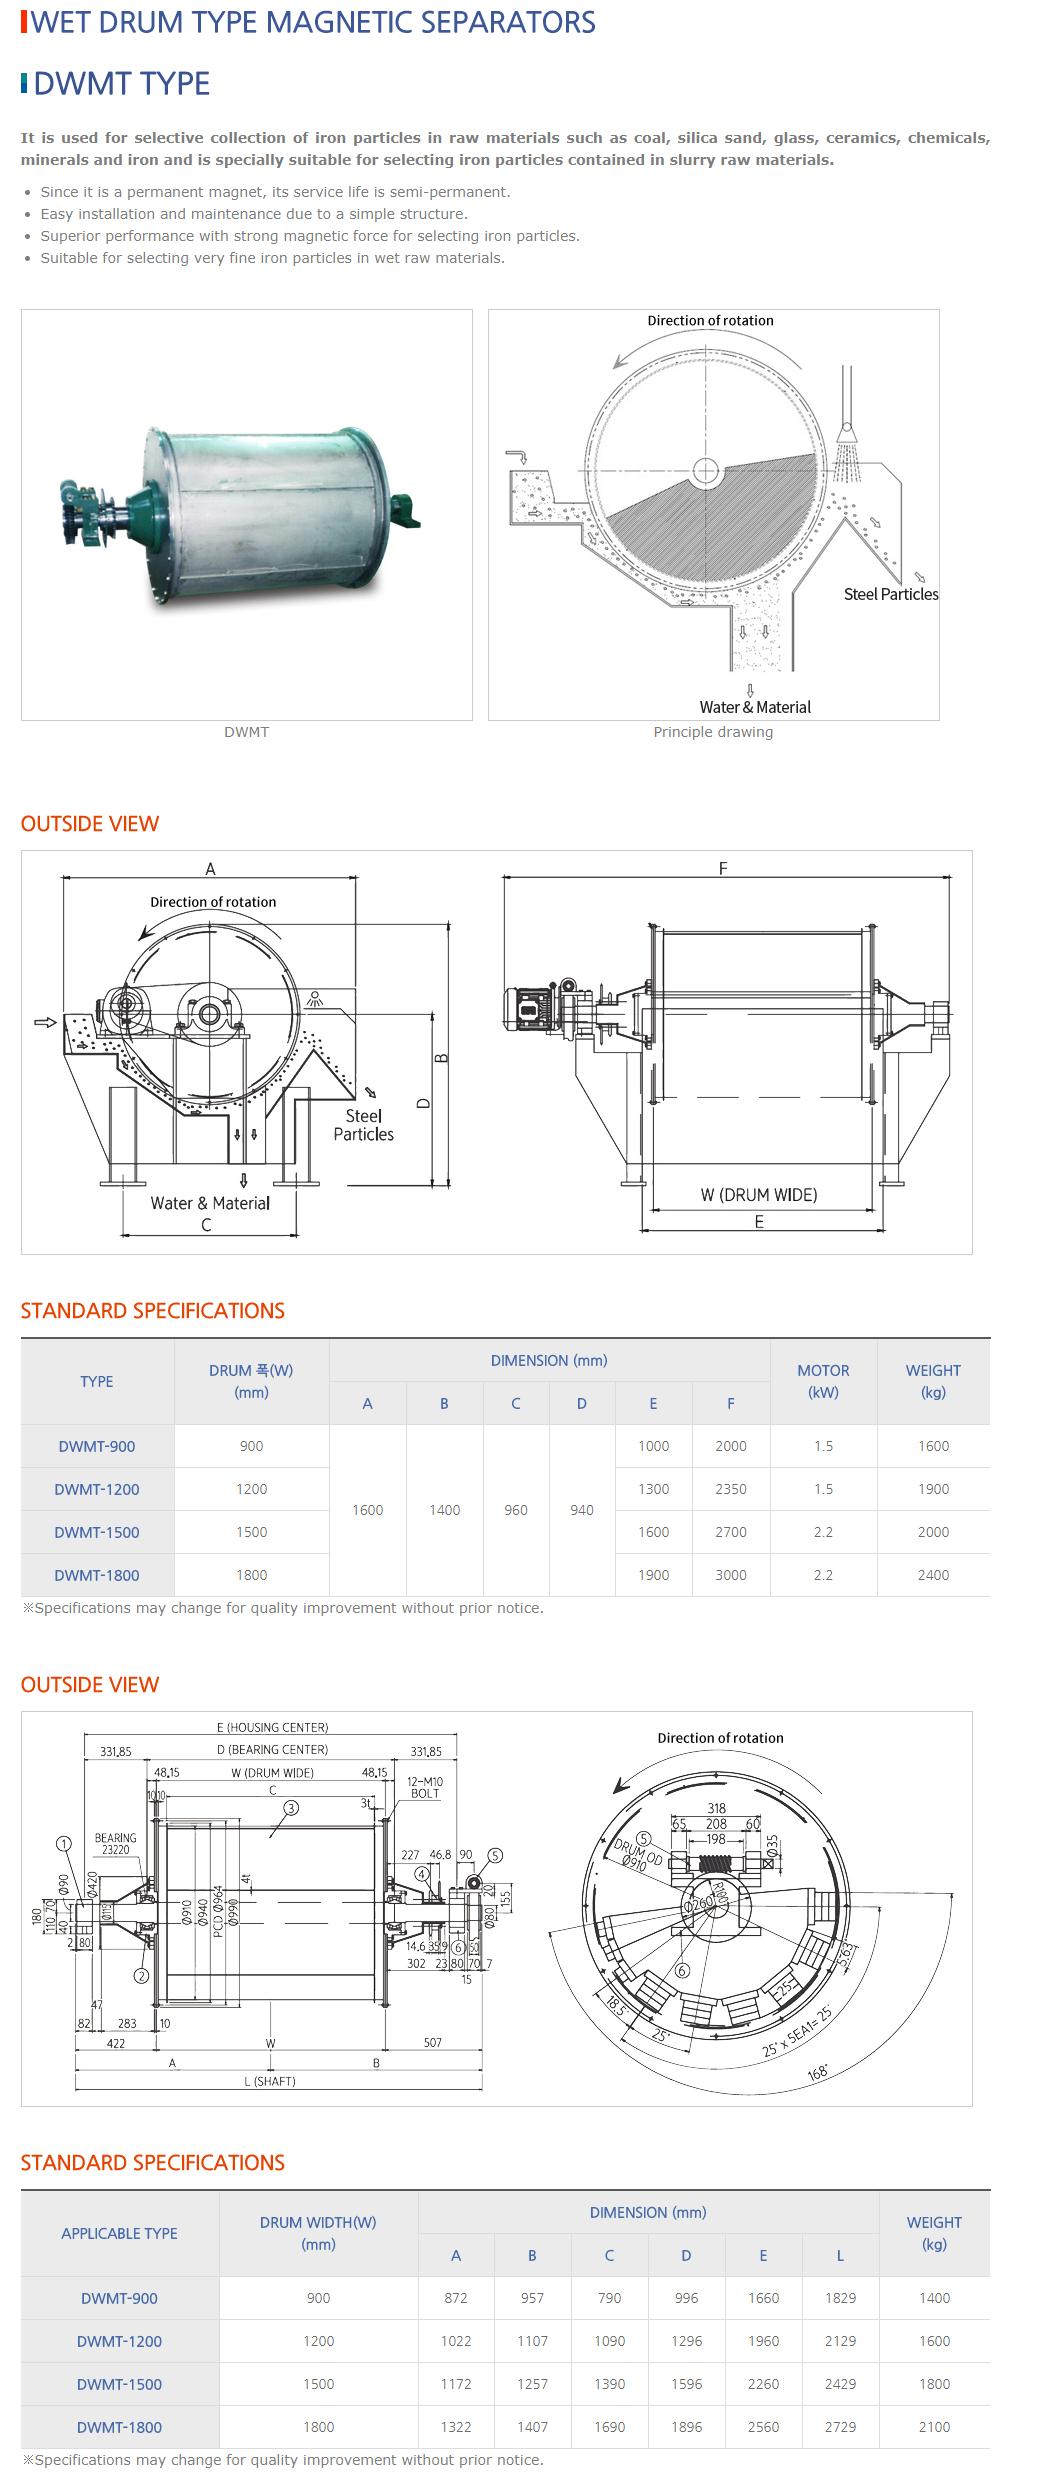 DAESUNG MARGNET Wet Drum Type Magnetic Separators DWMT Type